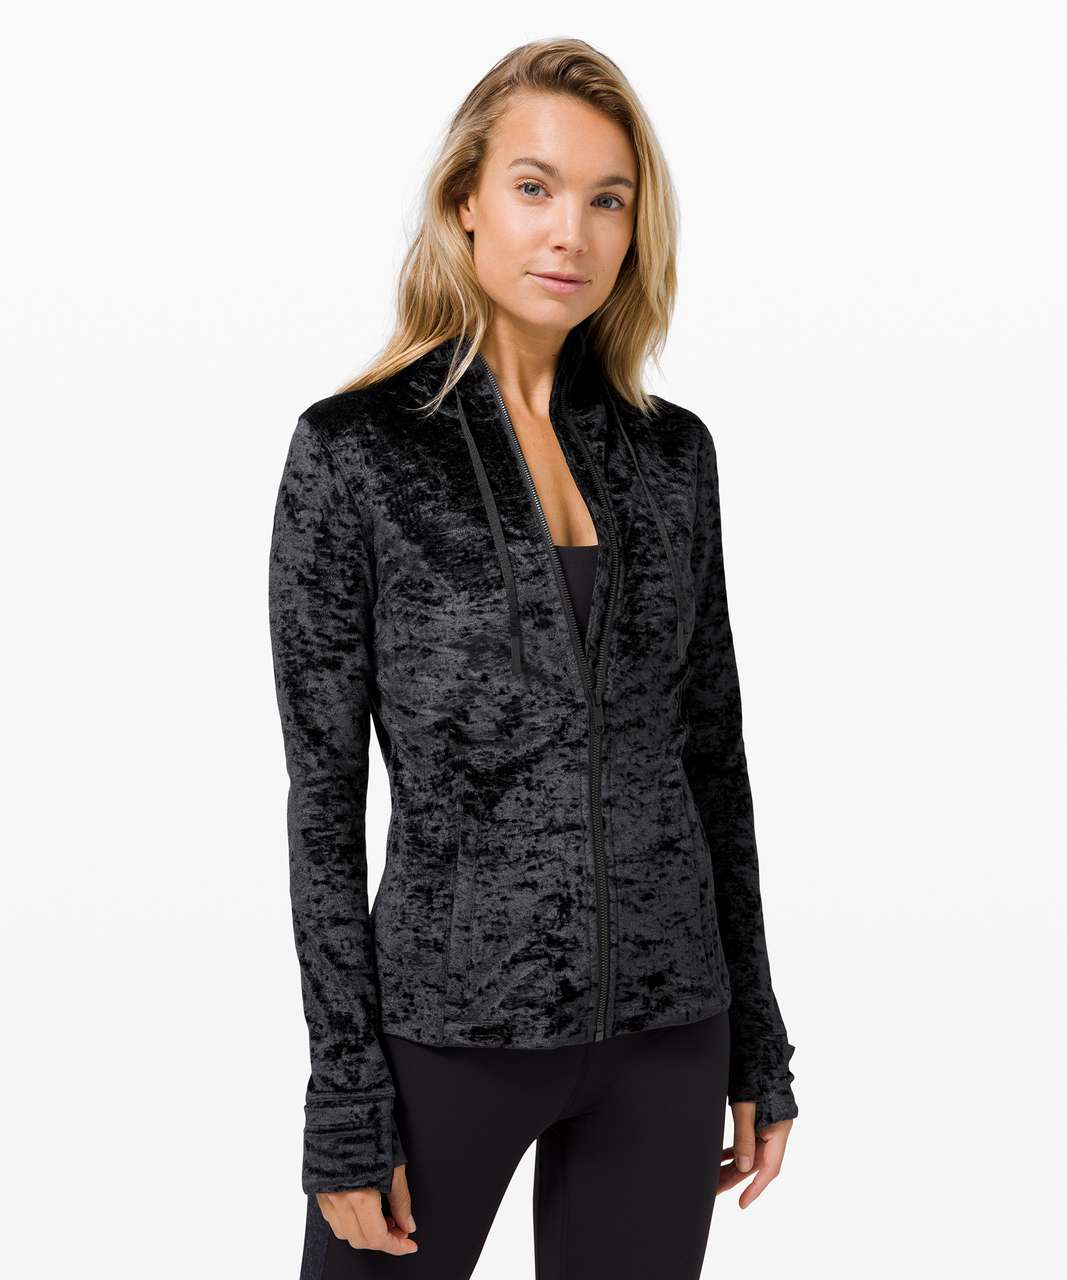 Lululemon Hooded Define Jacket *Crushed Velvet - Black